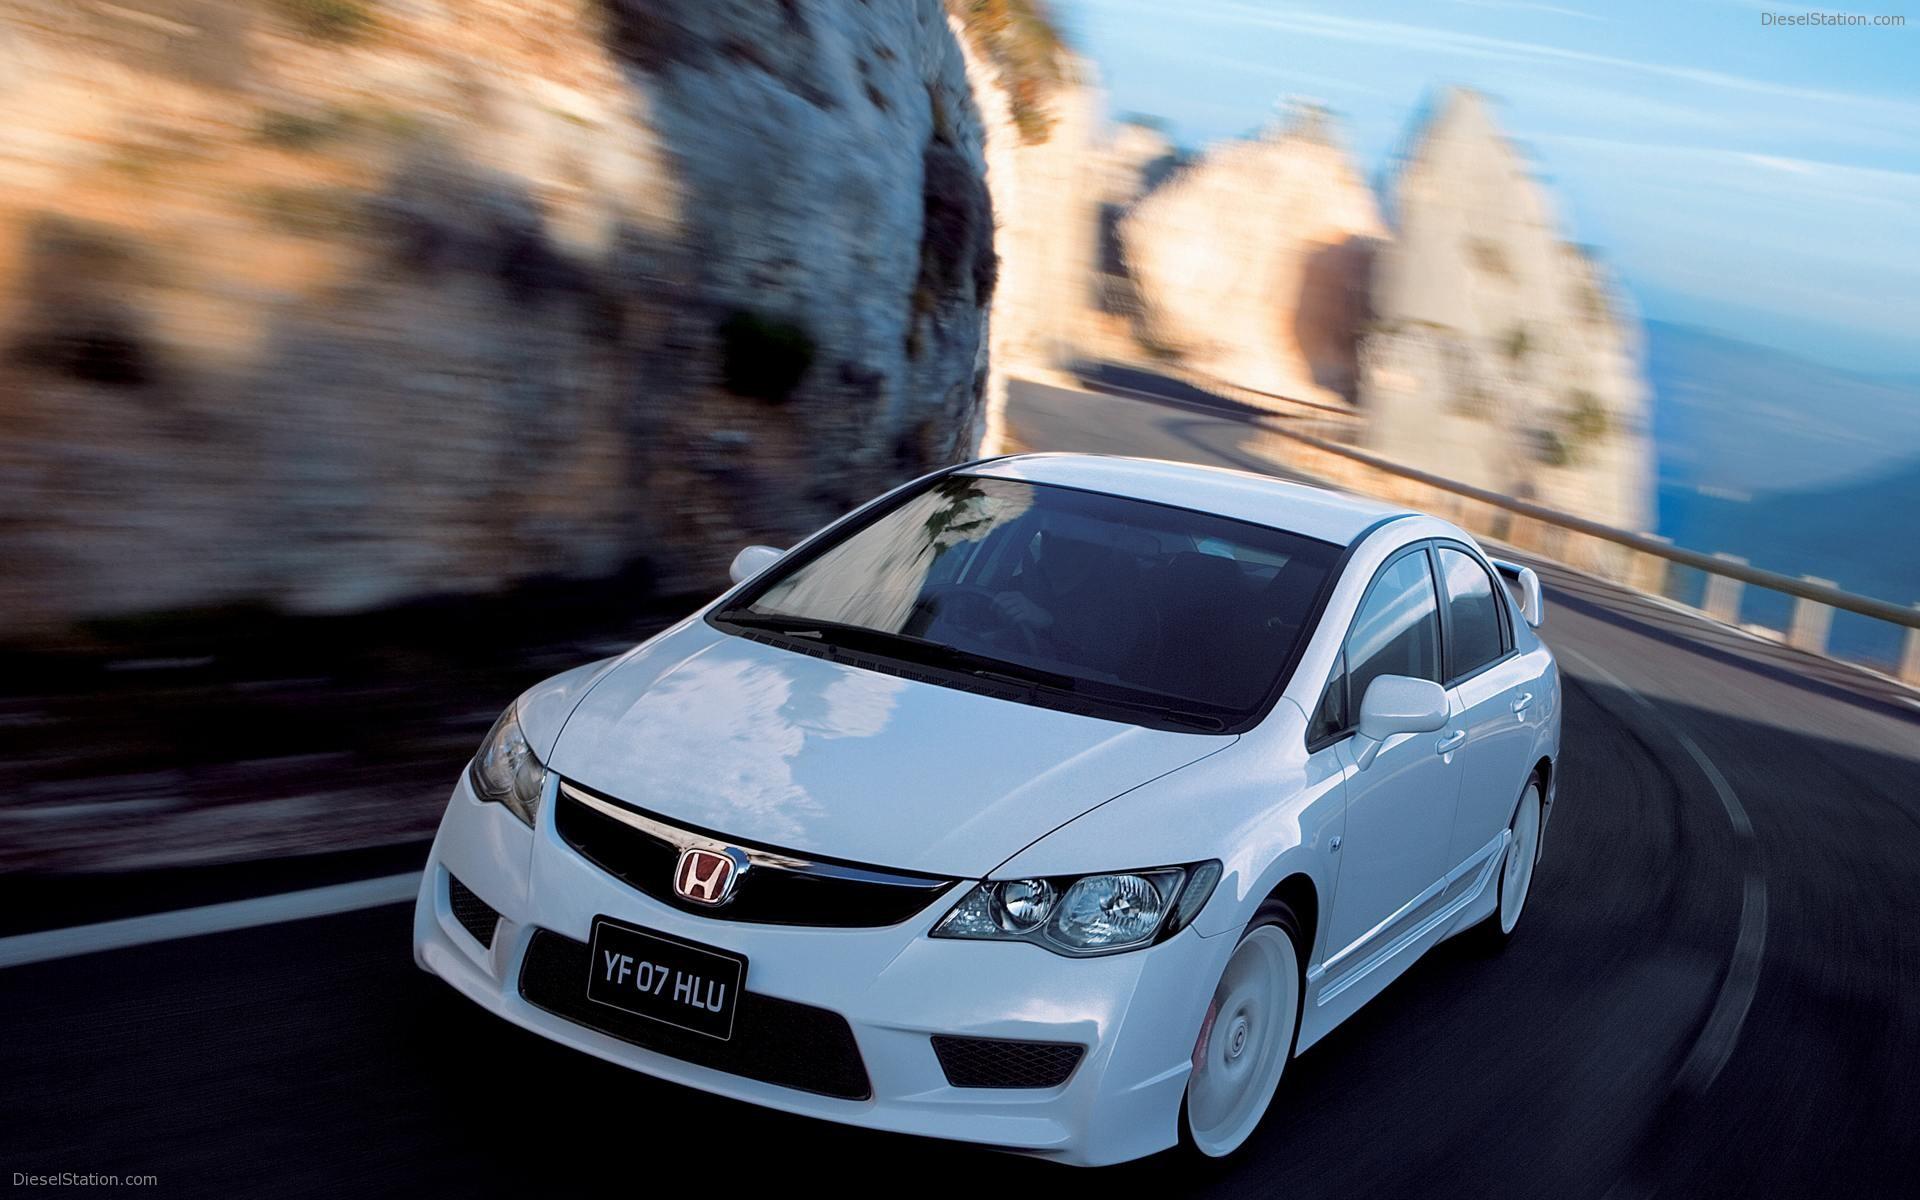 43 units of Honda Civic Wallpaper